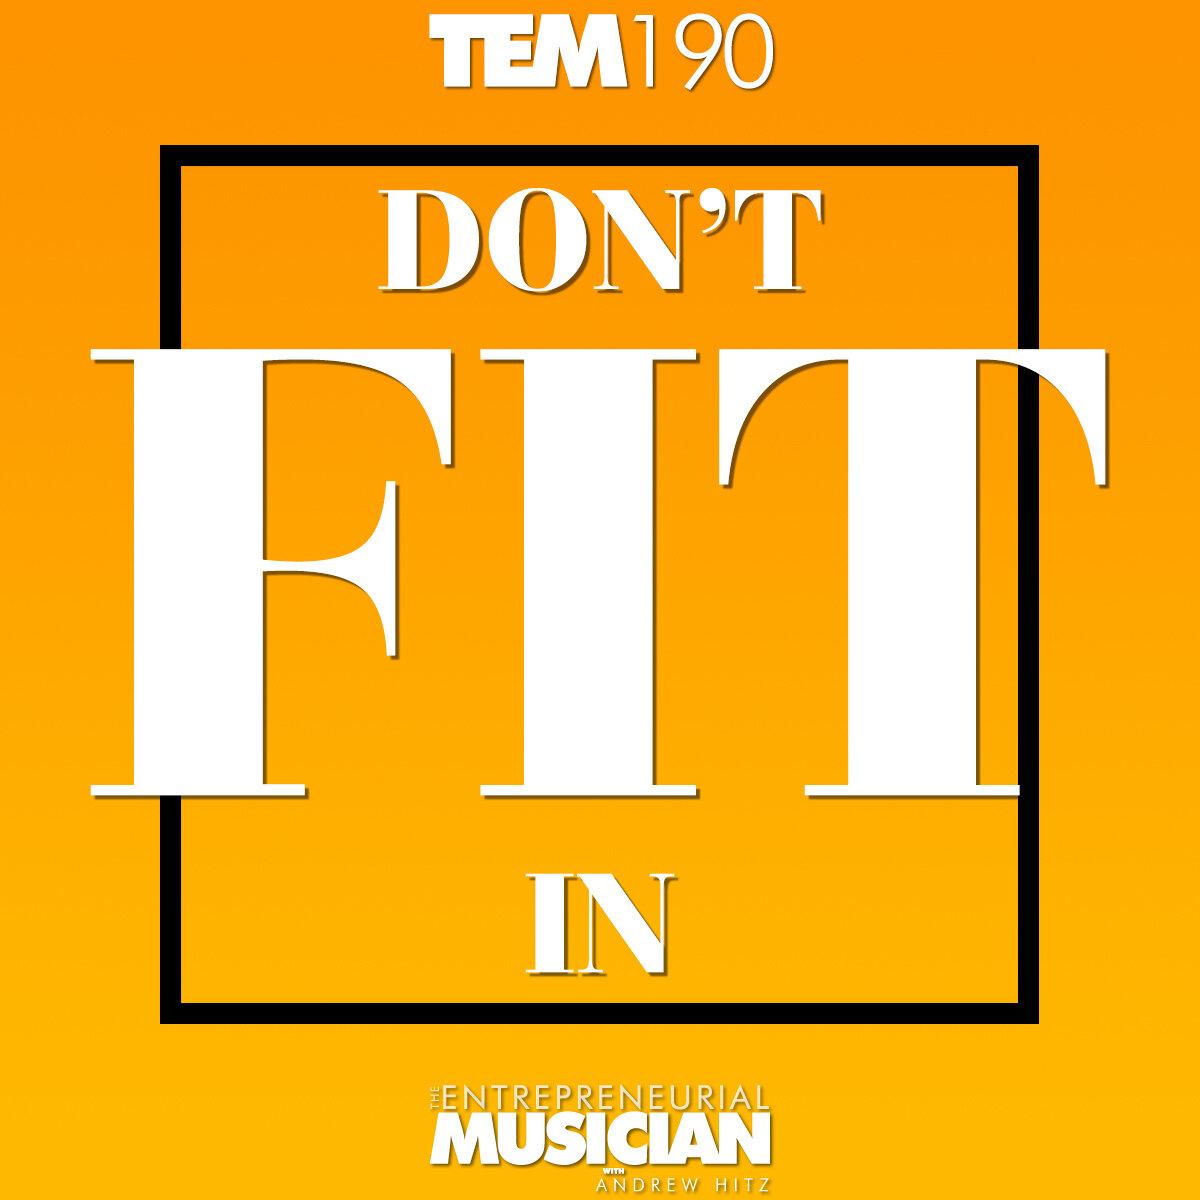 TEM190-Promo.jpg